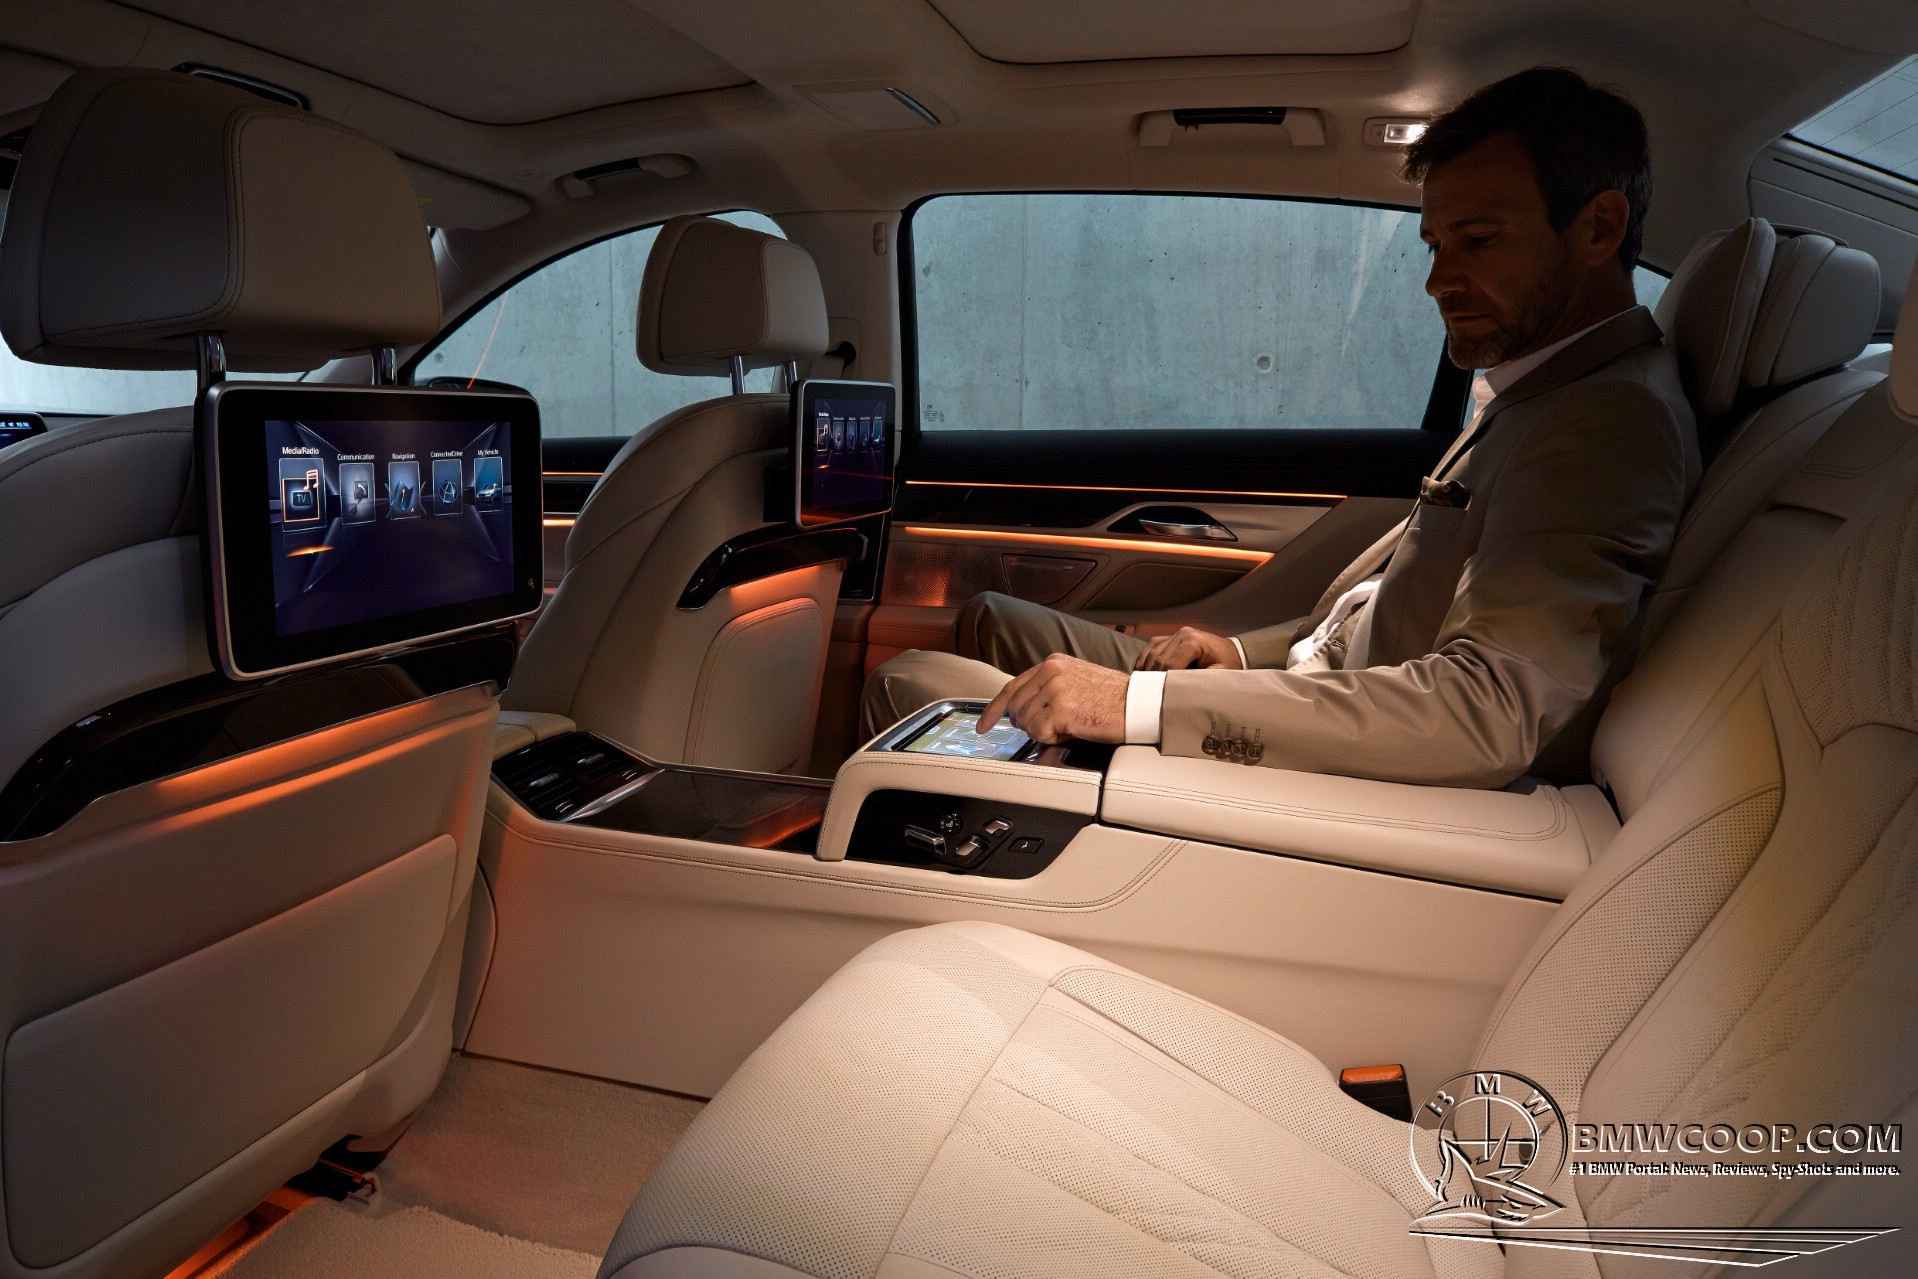 2016 BMW 7 Series Interior Design